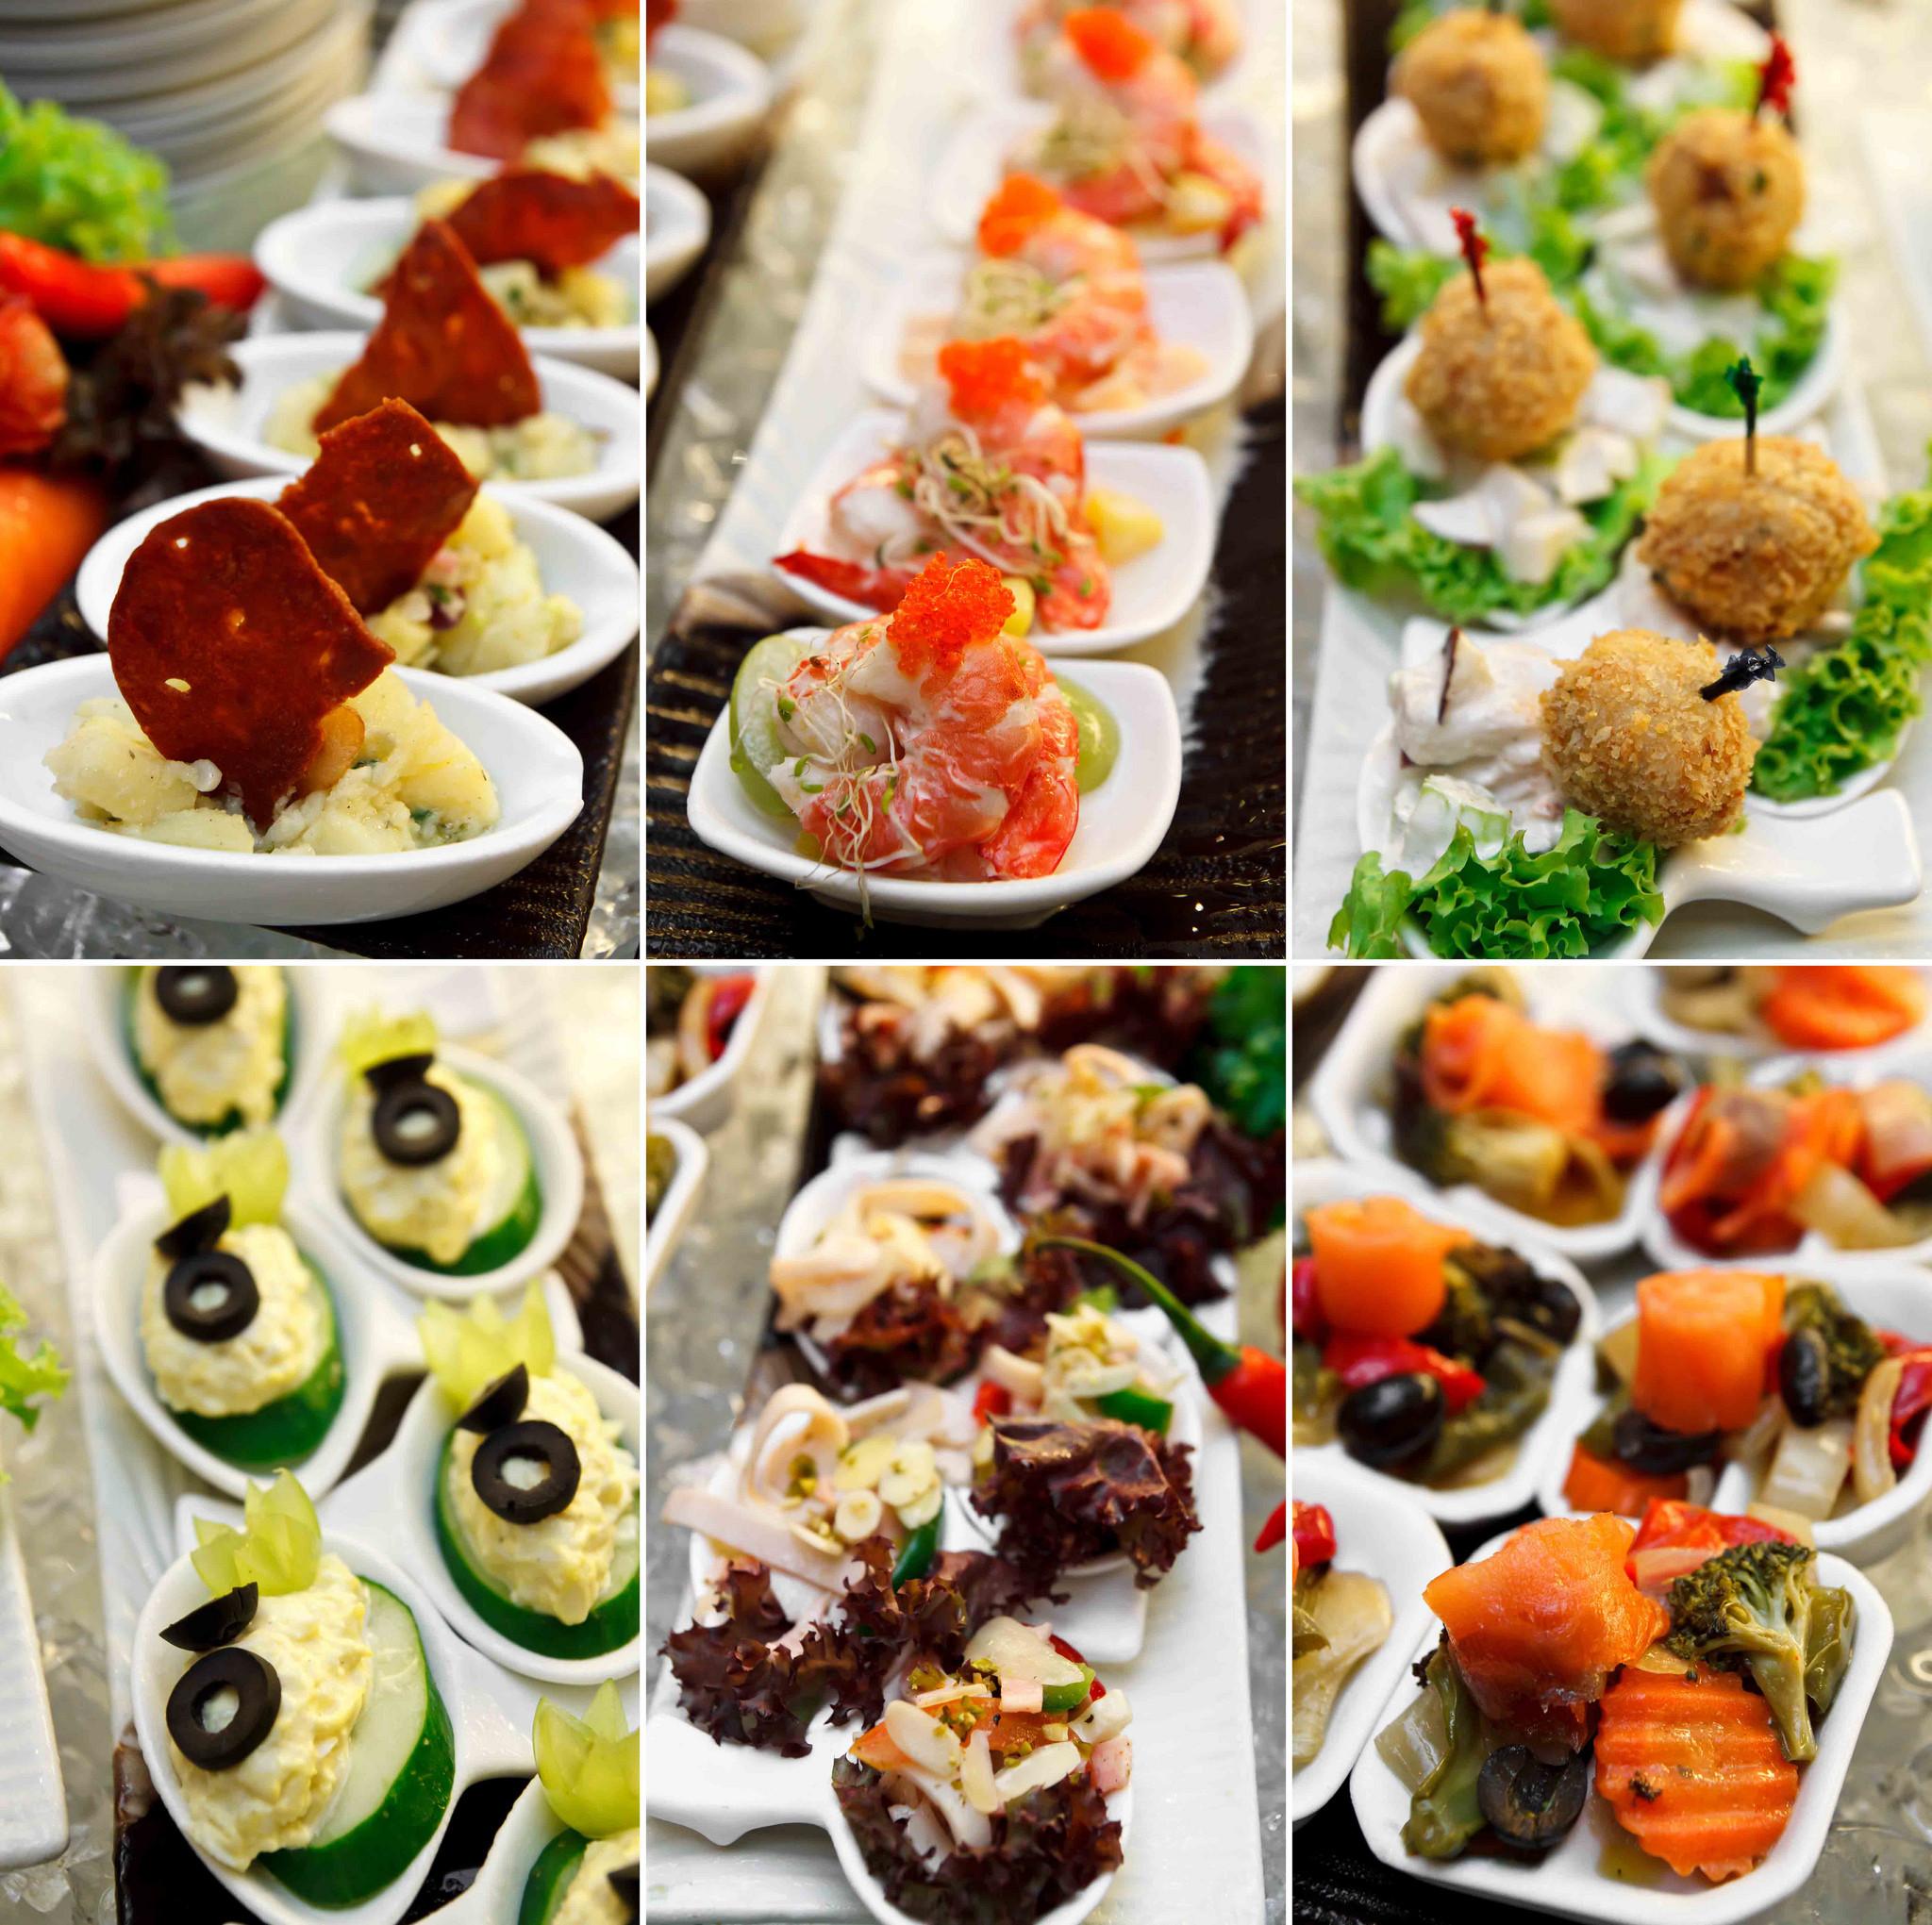 Cold Italian Appetizers  Checkers Cafe Dorsett Regency Kuala Lumpur Invited